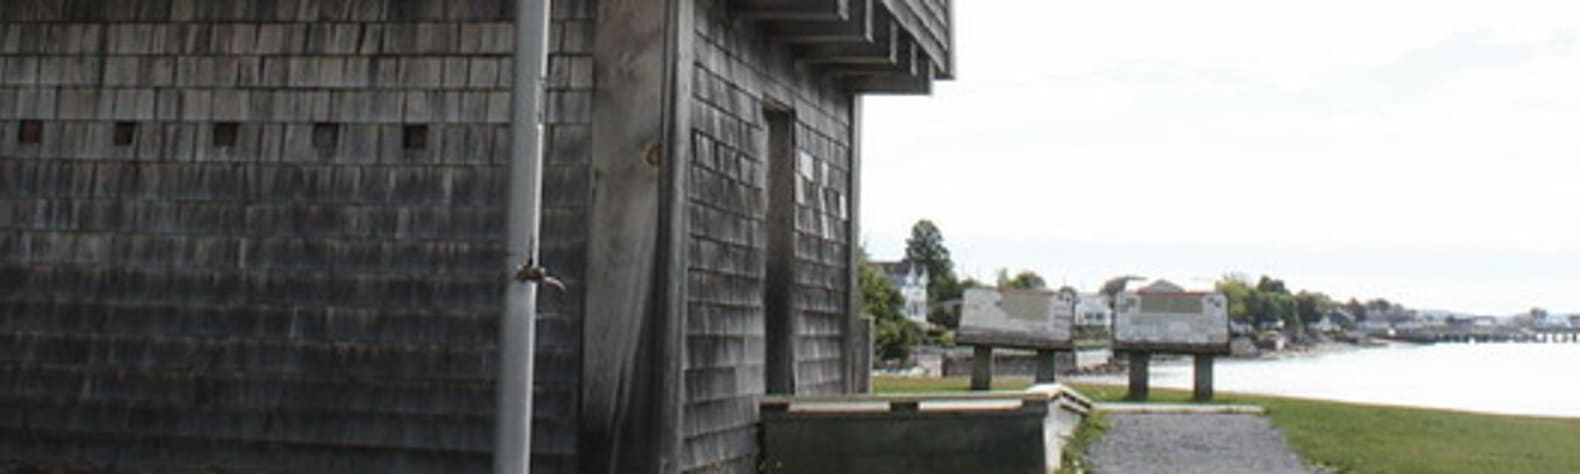 St. Andrew's Blockhouse National Historic Site